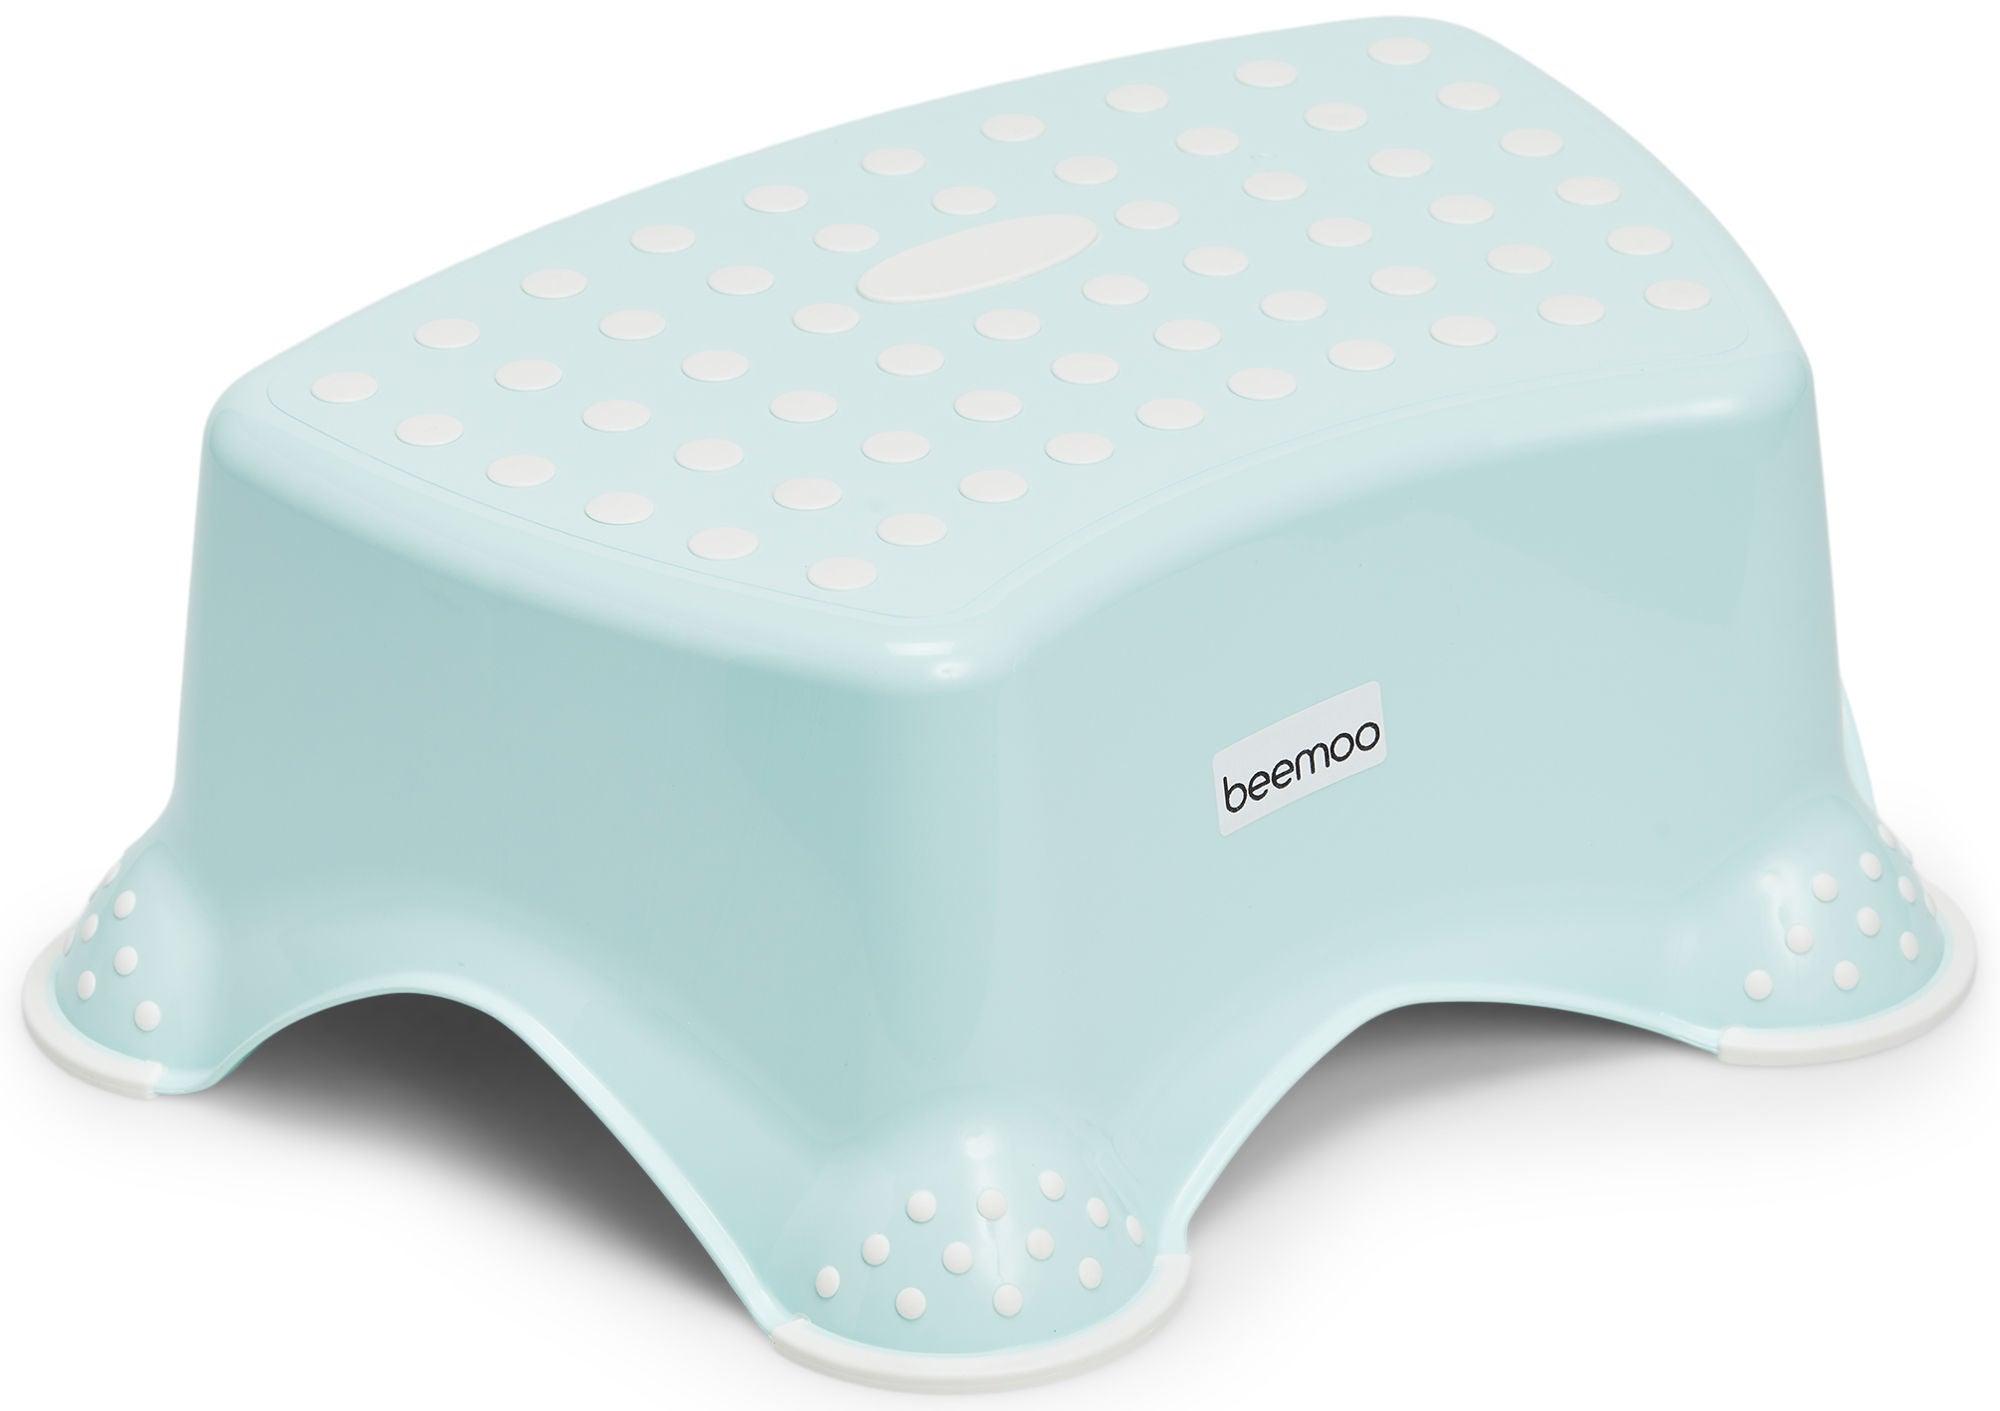 Beemoo Care Koroke, Aquamarine